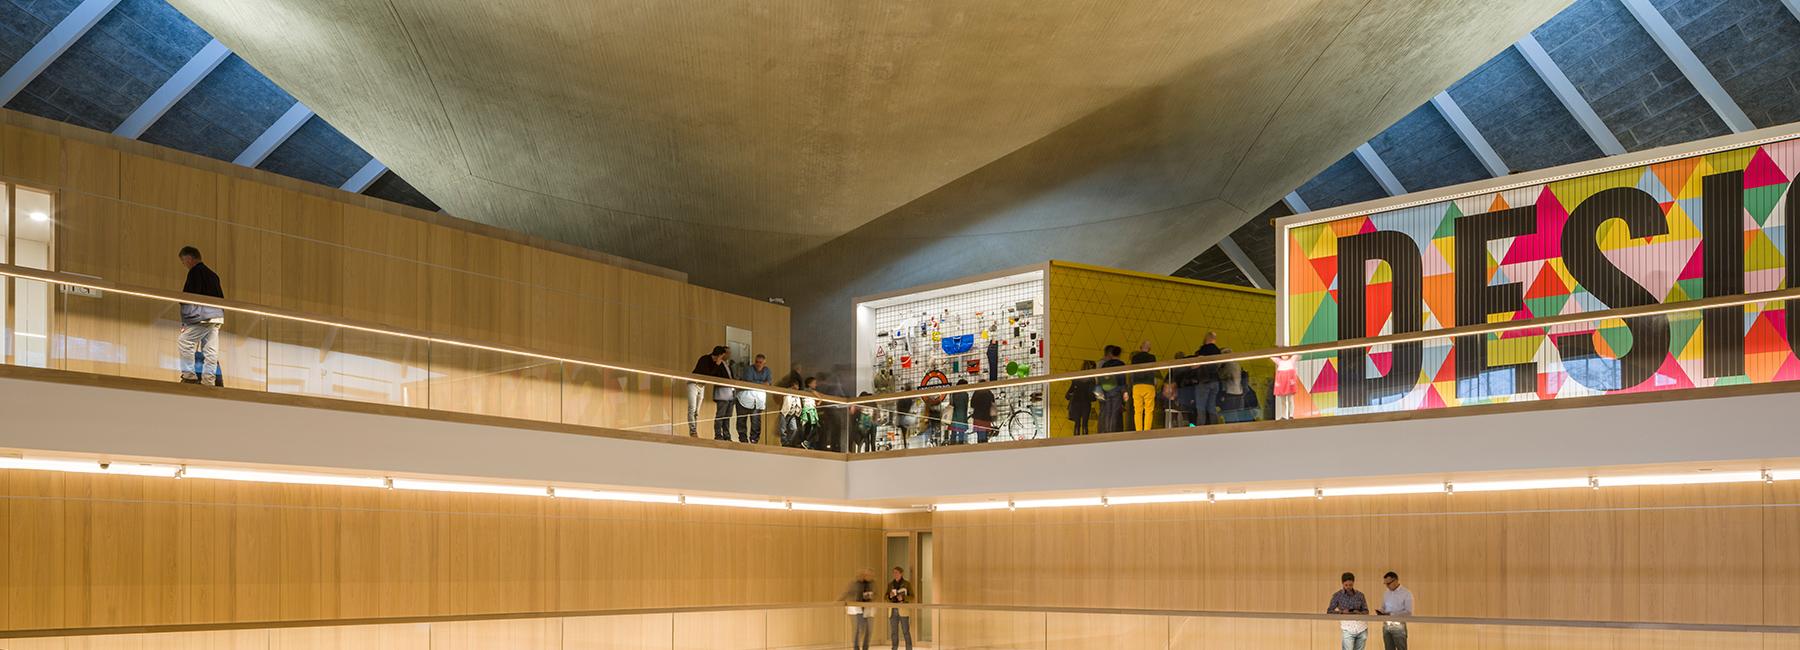 london s landmark design museum opens financial tribune. Black Bedroom Furniture Sets. Home Design Ideas